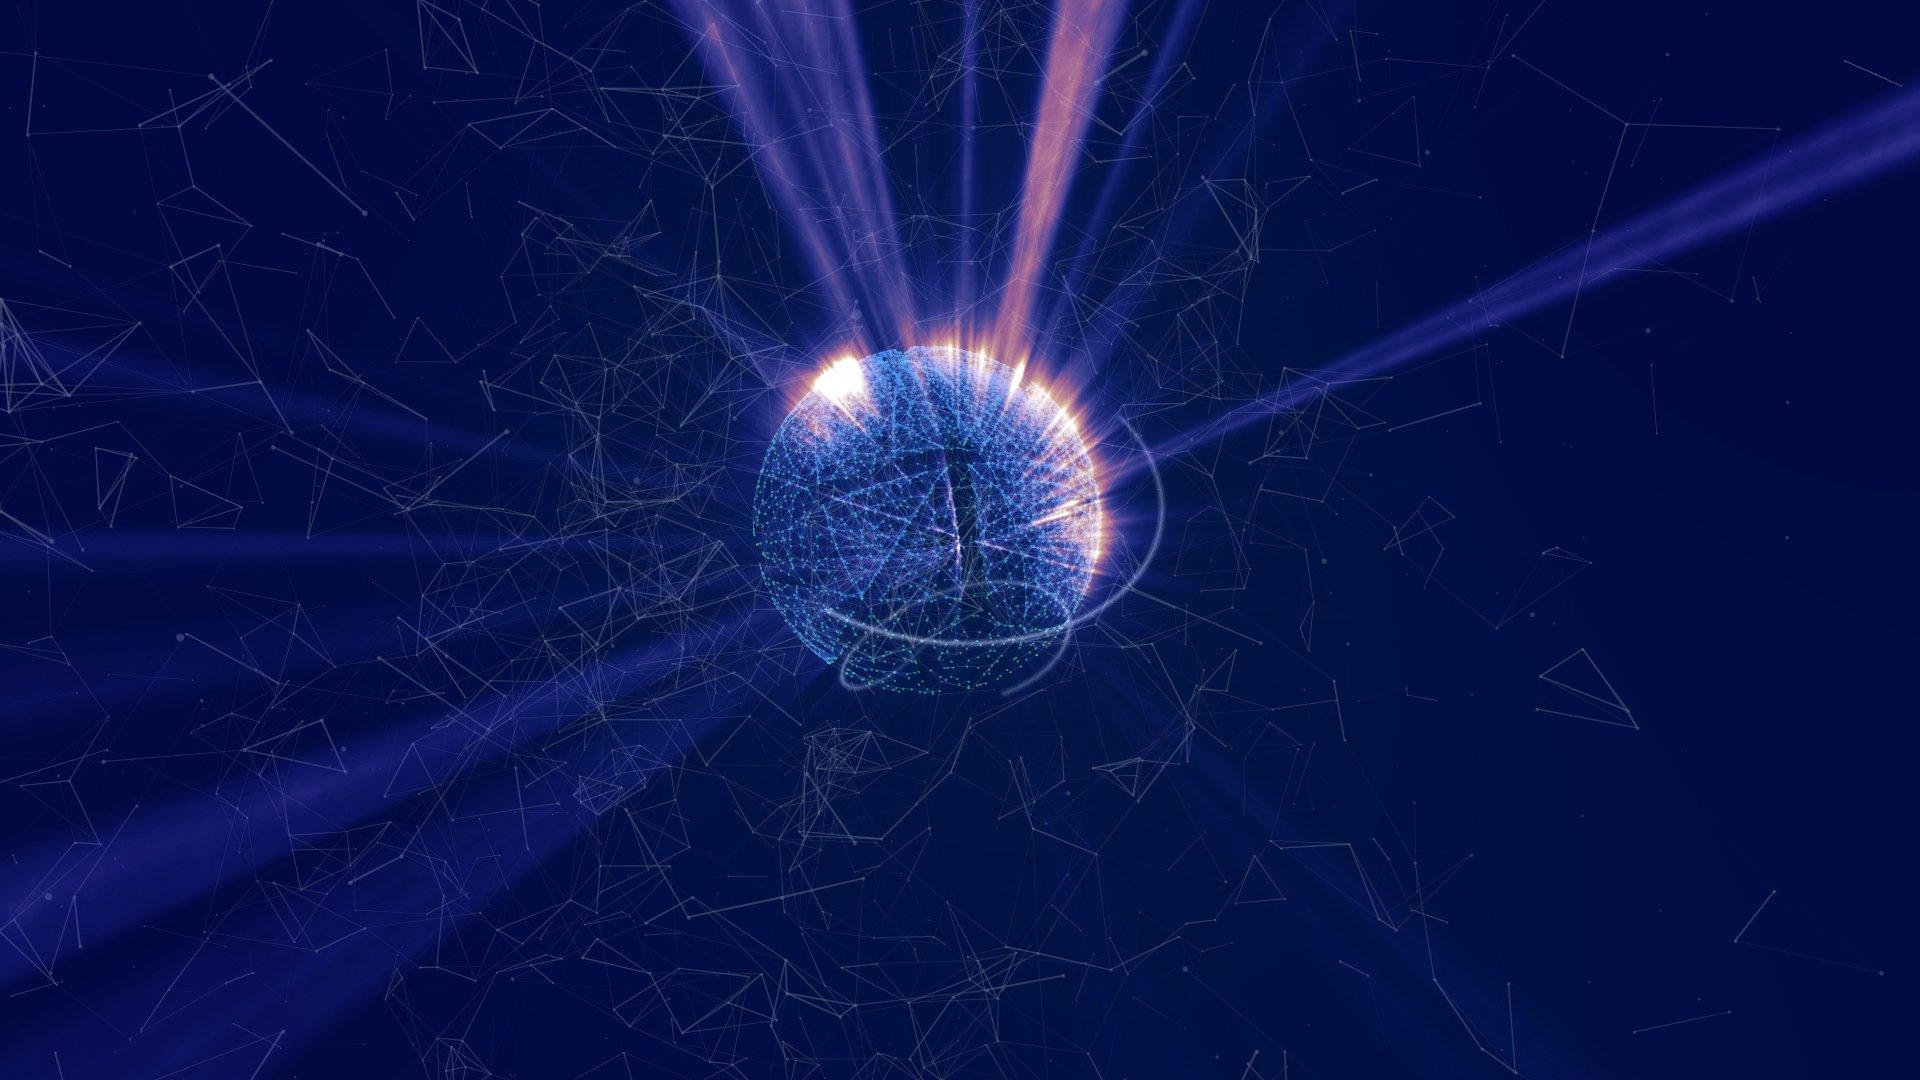 Arbus med konkurranse for kvantedatamaskiner